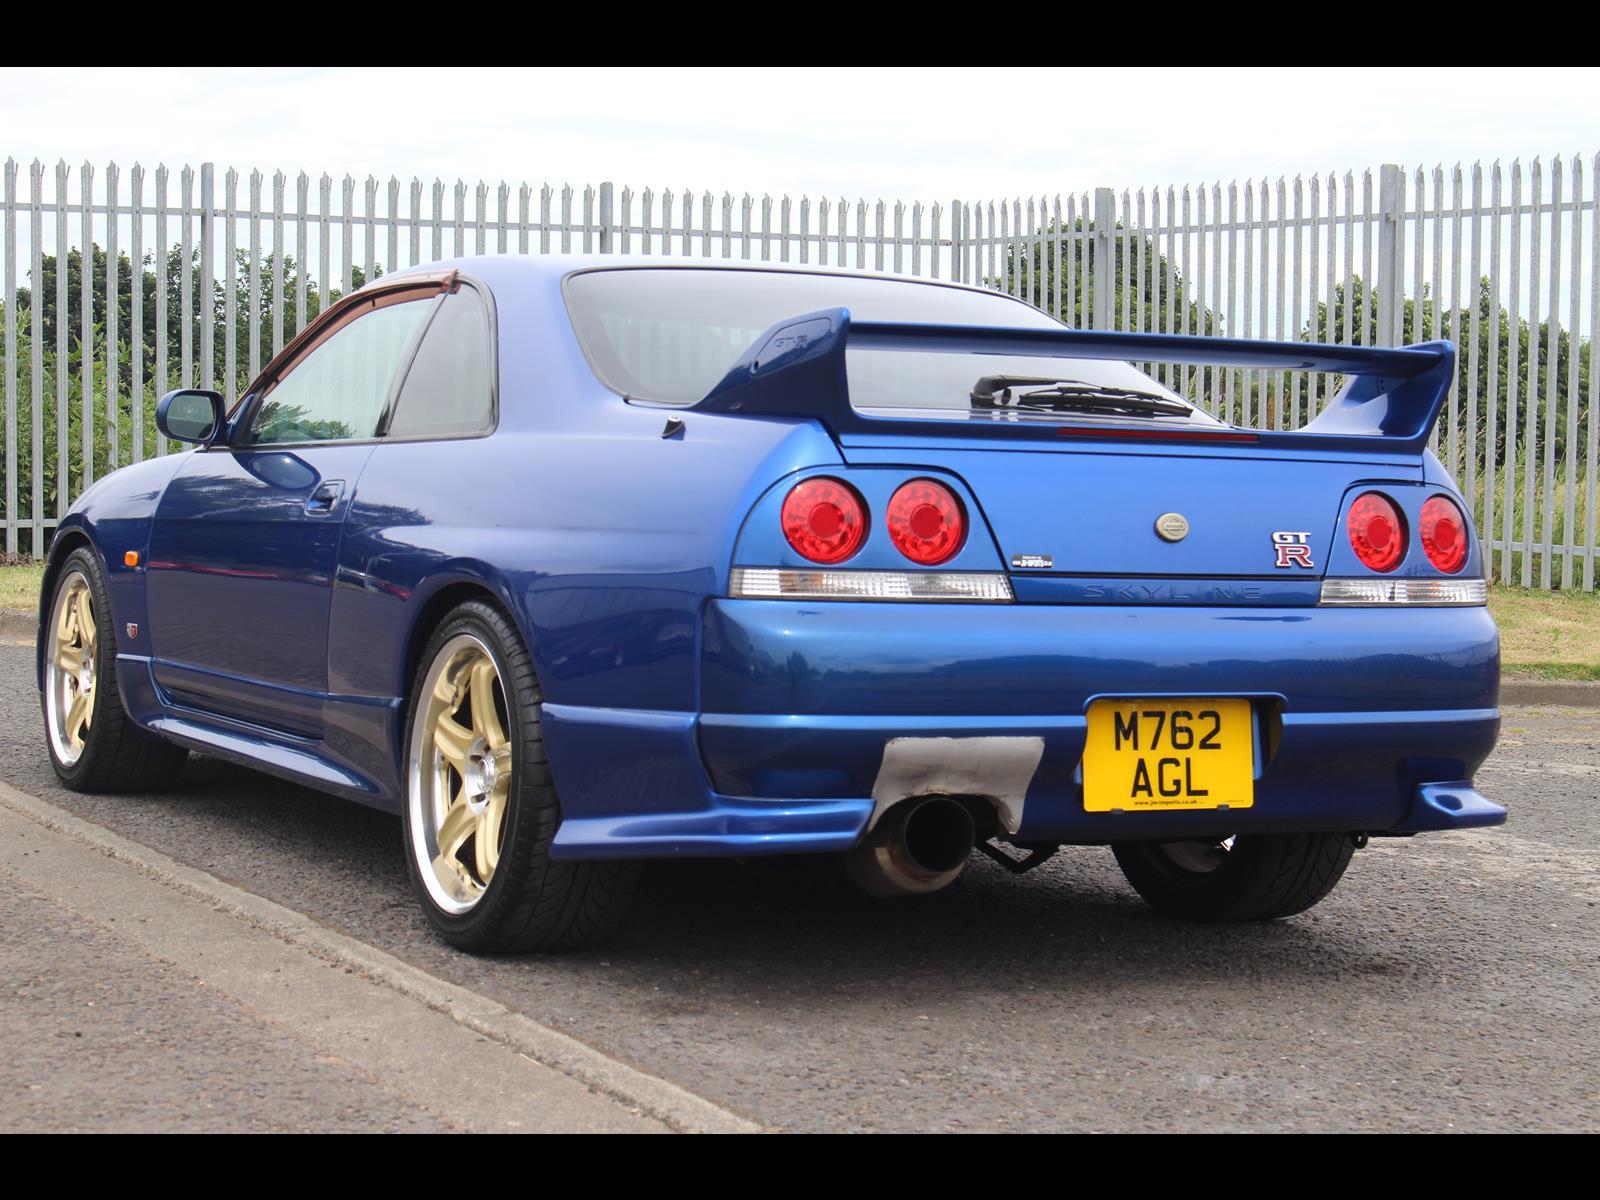 1995 Nissan Skyline R33 Gtr 5 Speed Manual